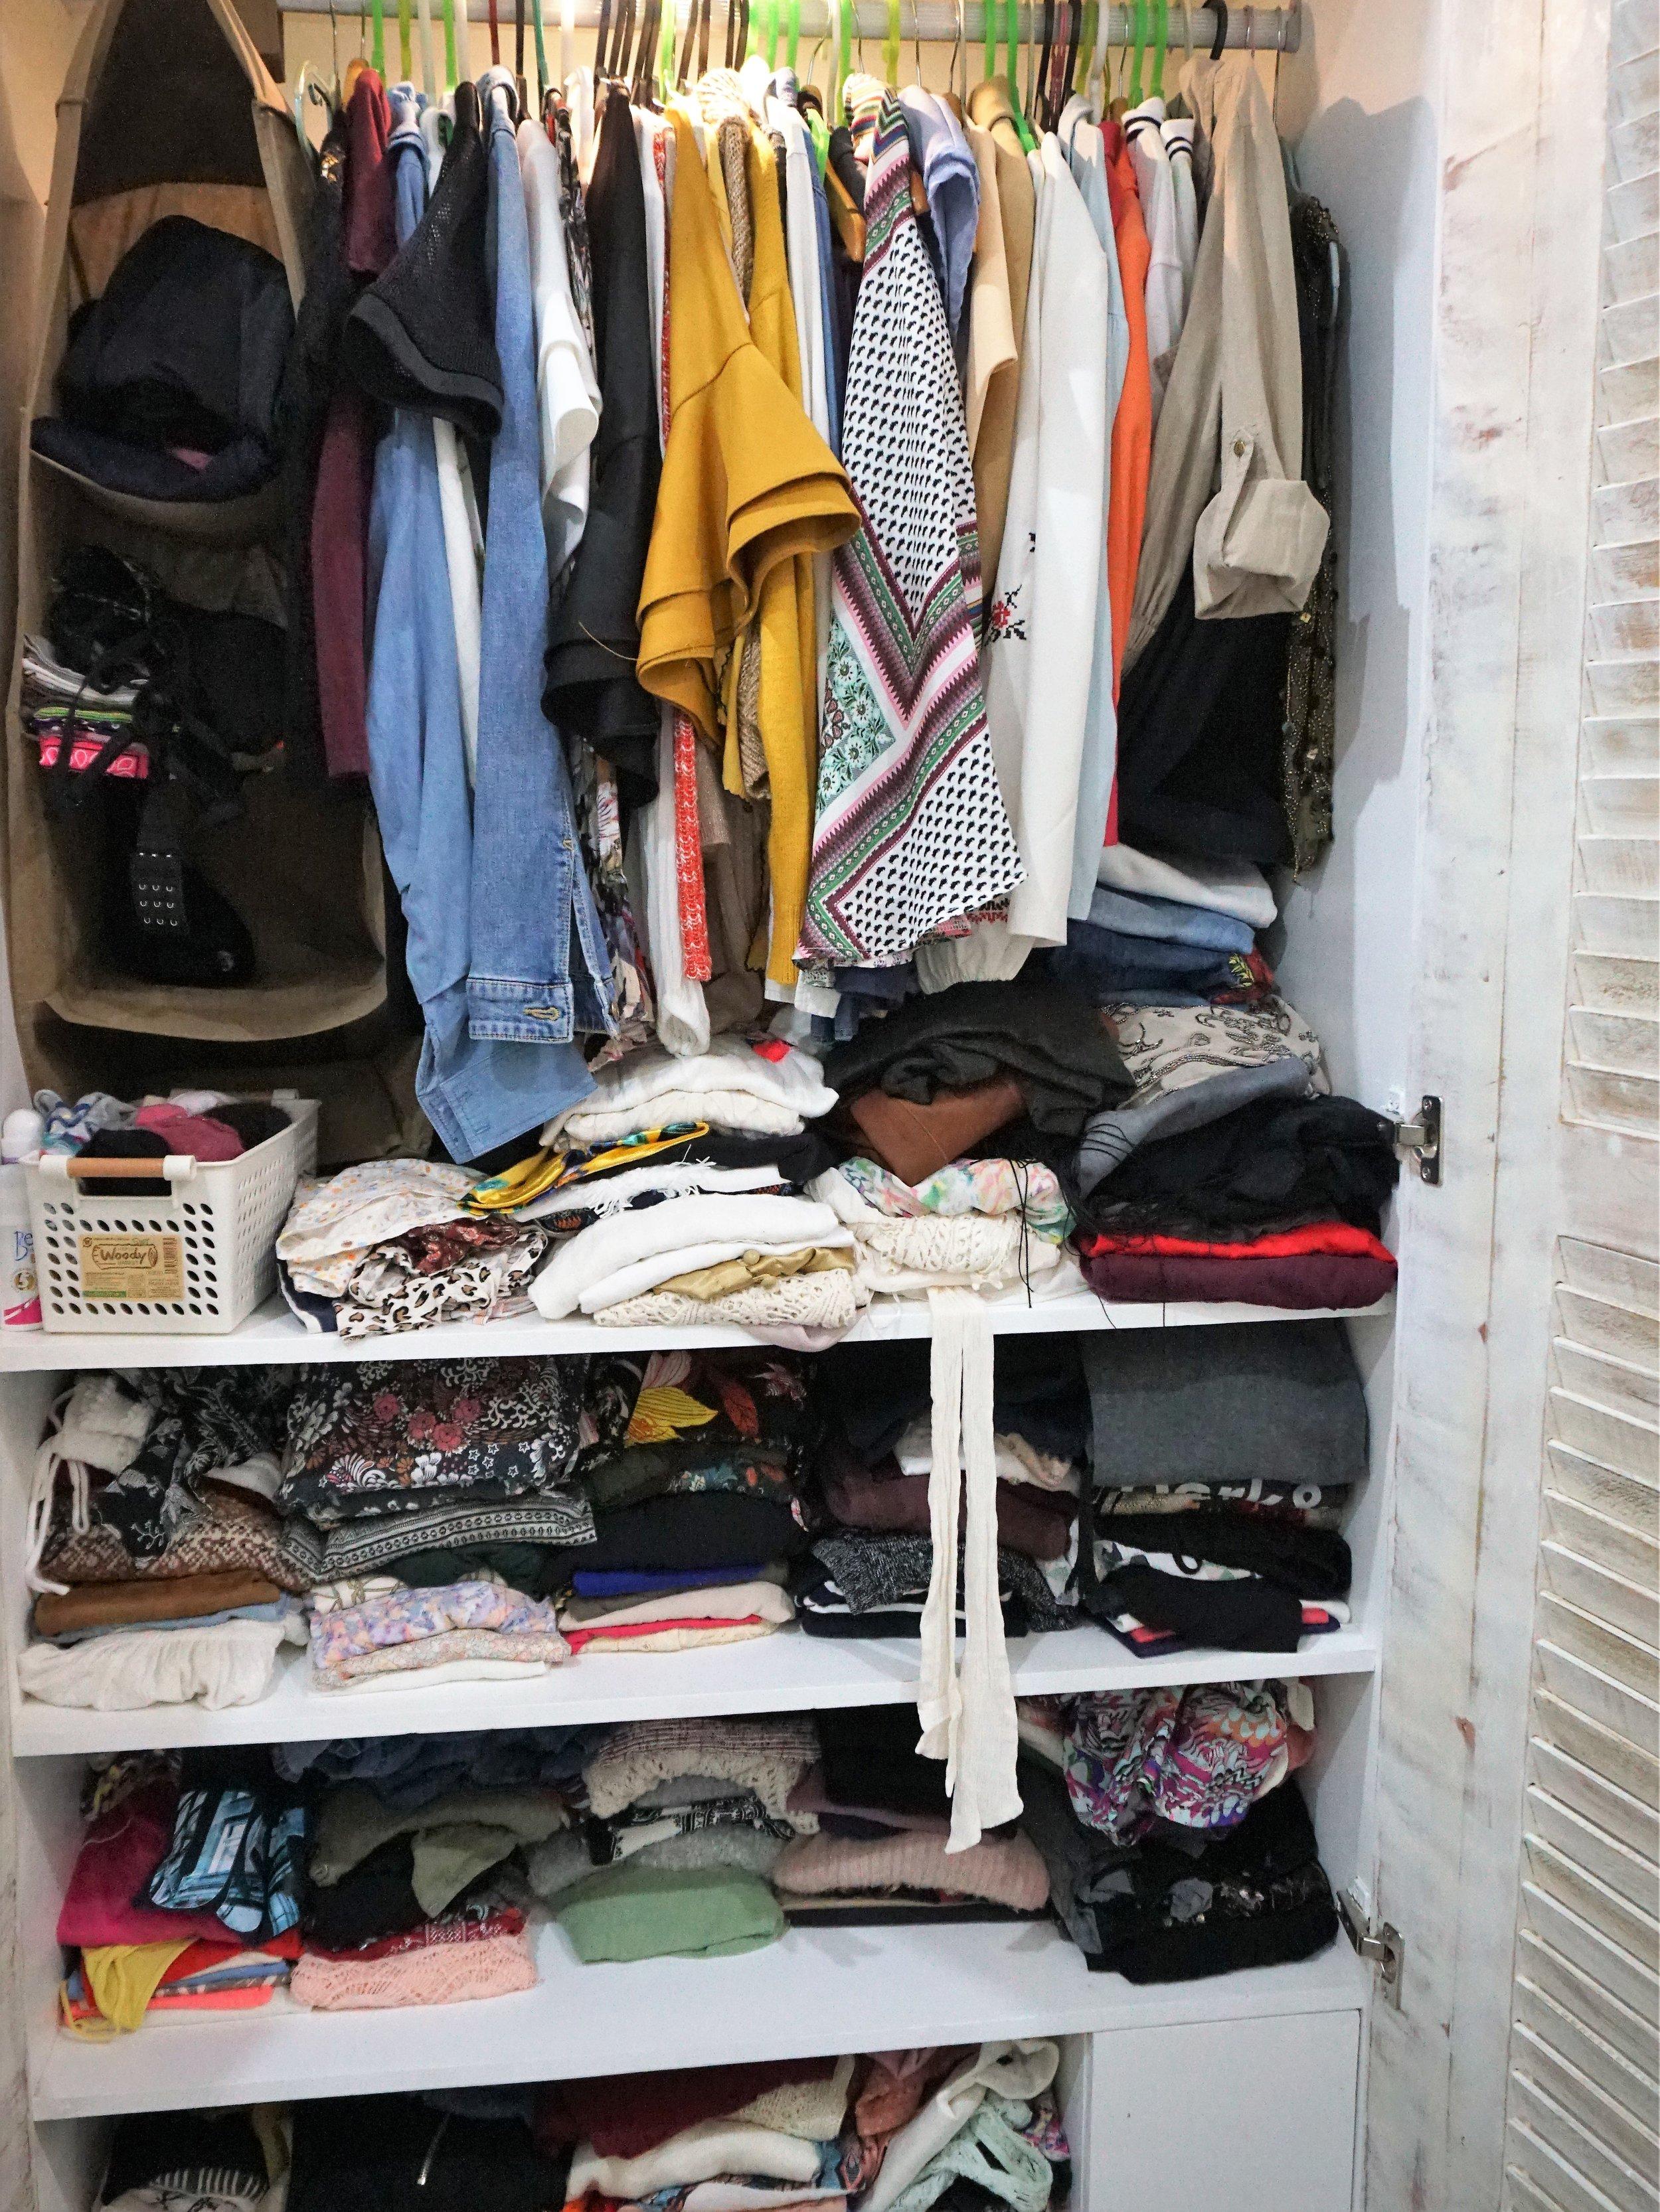 BEFORE_Closet_Full_edited.jpg